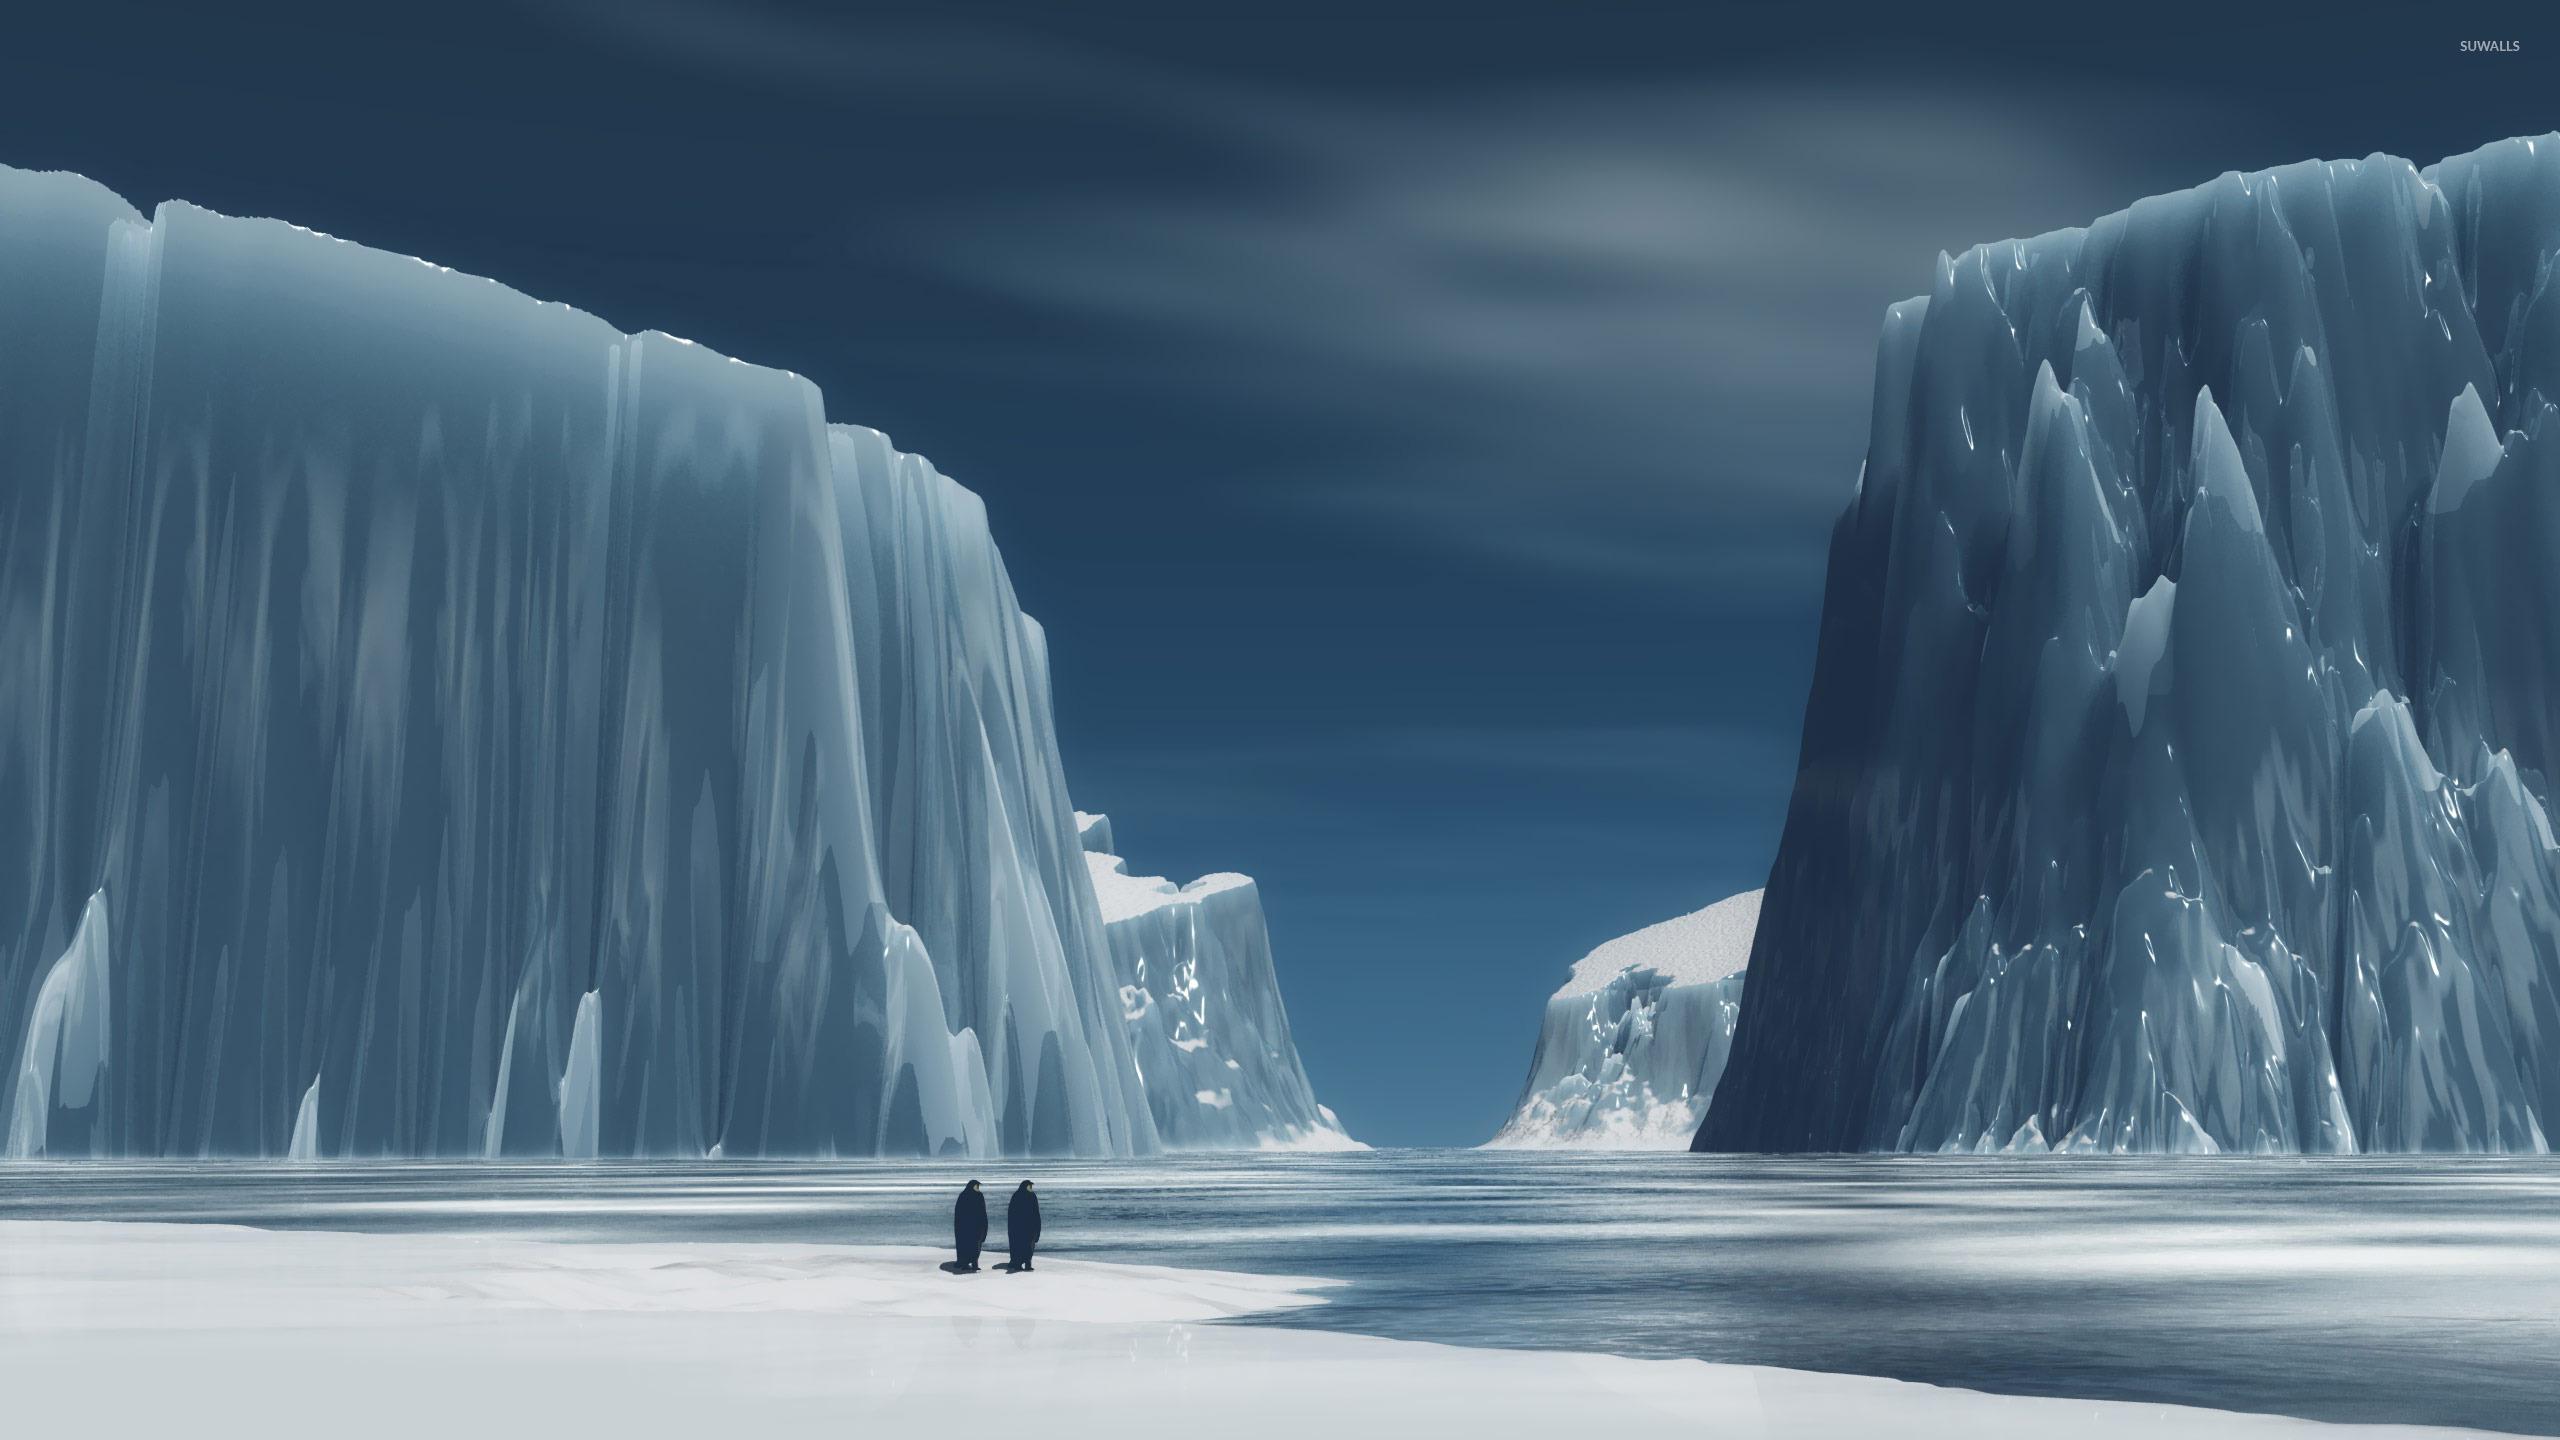 Penguins in antarctica wallpaper digital art wallpapers for Where to go in antarctica